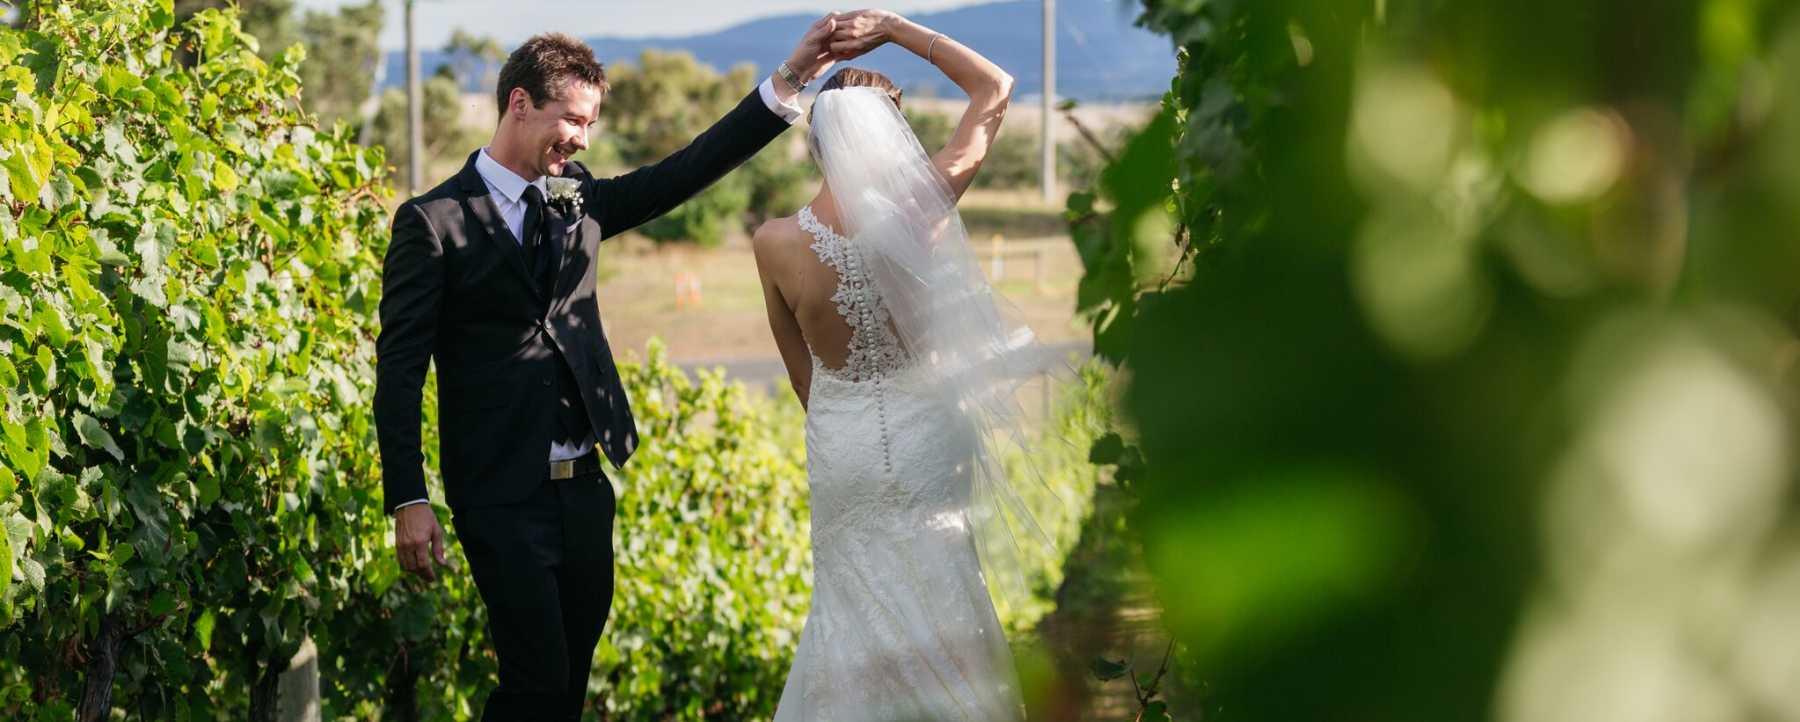 Wedding Ceremony at Balgownie Estate in Yarra Valley